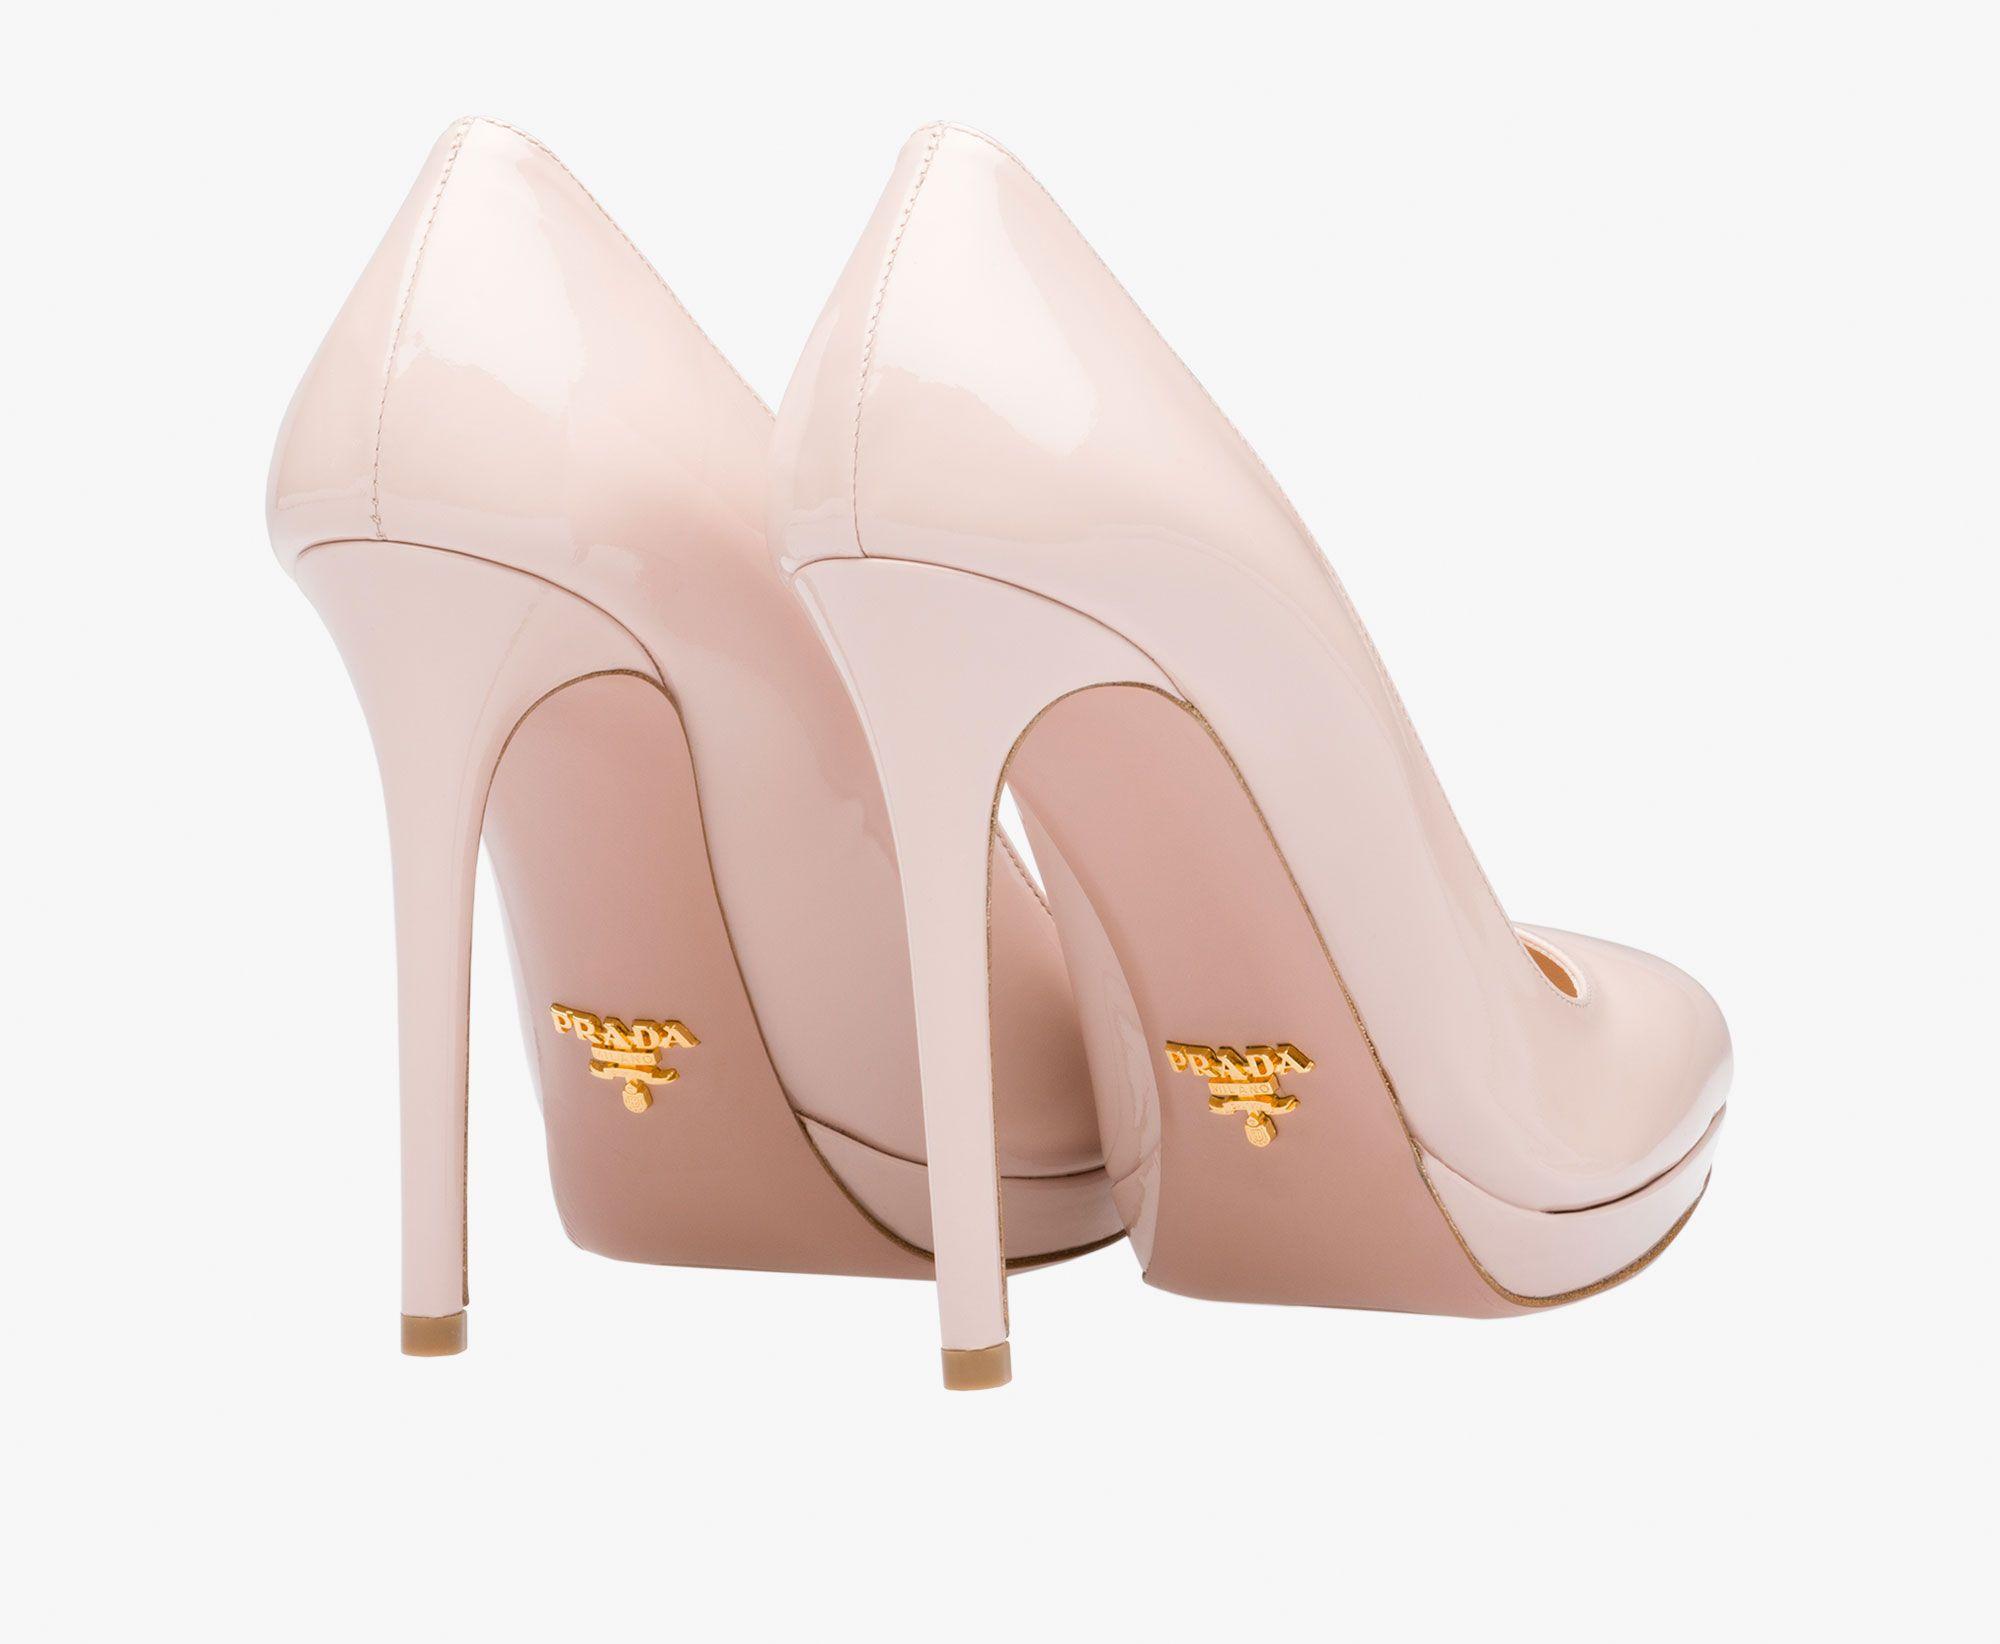 1IP286_069_F0236_F_110 pump - Footwear - Woman - eStore   Prada.com